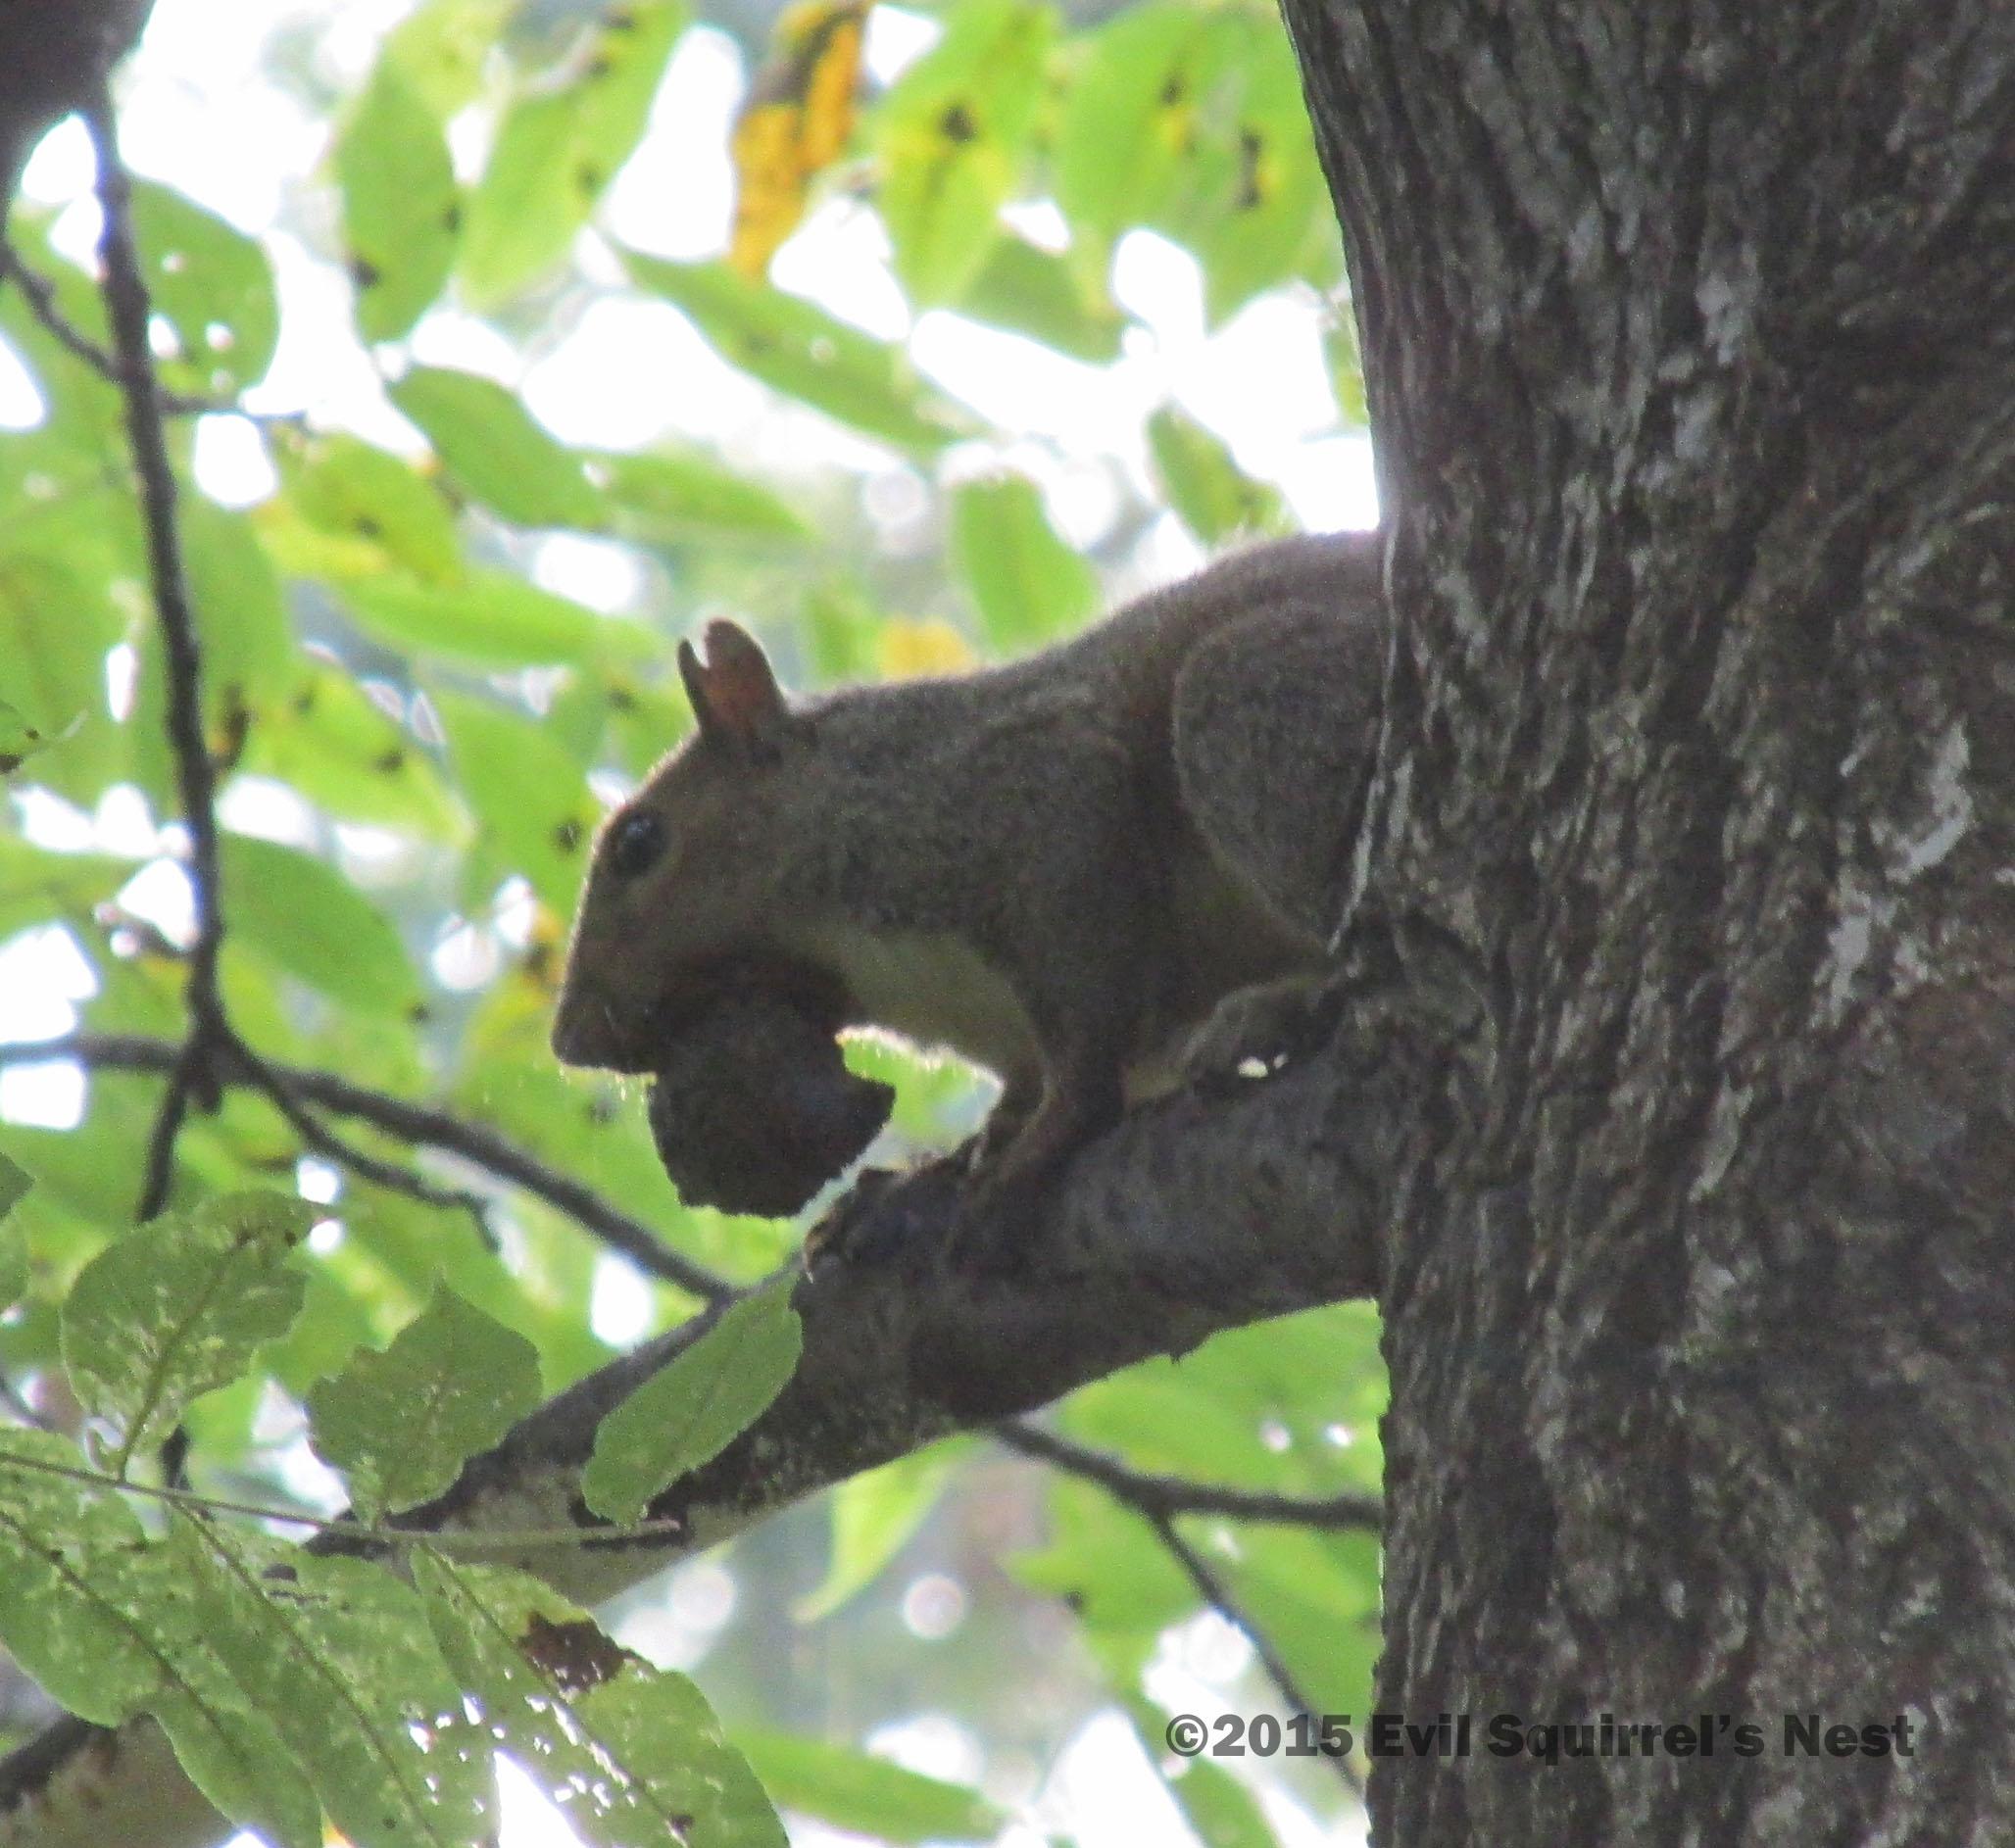 Images of Evil Squirrel Gif - #rock-cafe